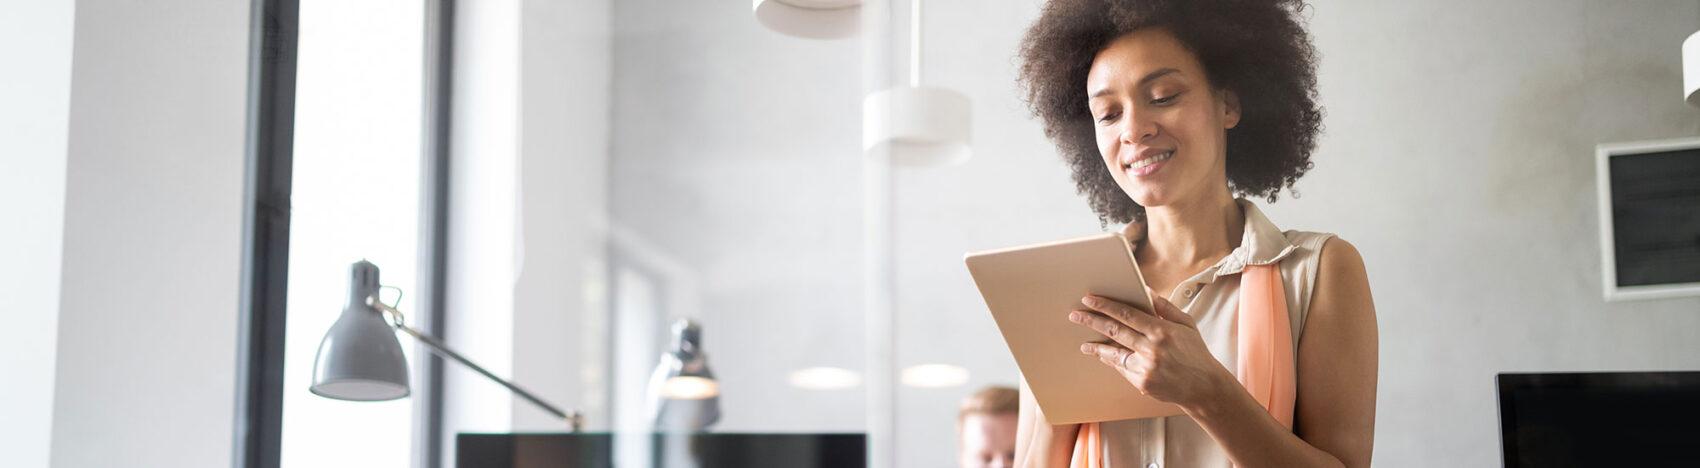 6 Key Elements of Digital Operations that Improve Business Performance